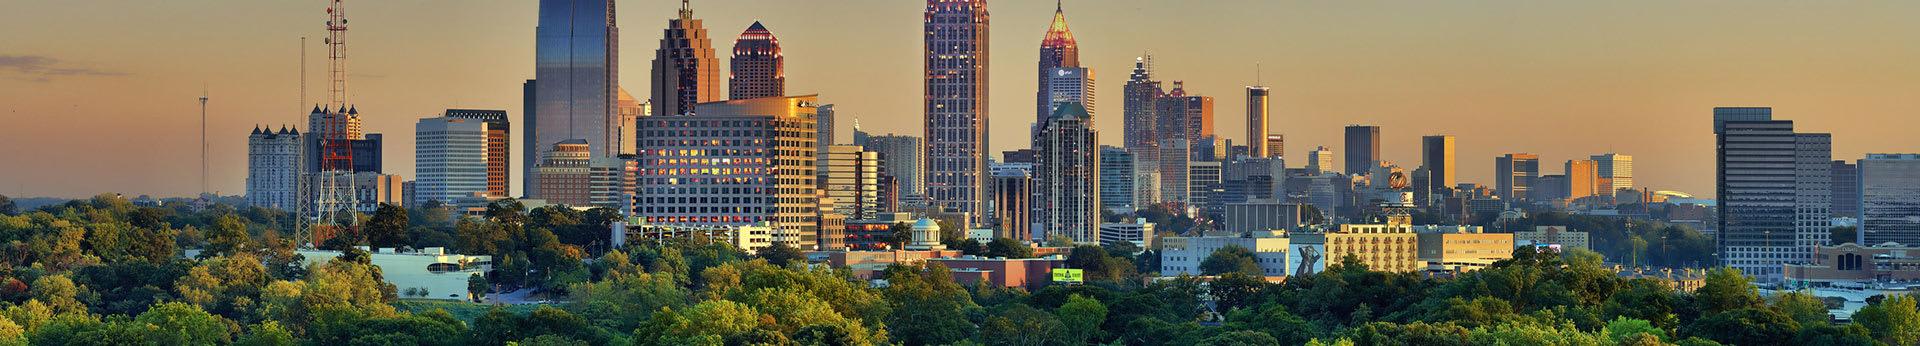 Downtown Atlanta Restaurants Best Places to Eat in Downtown Atlanta